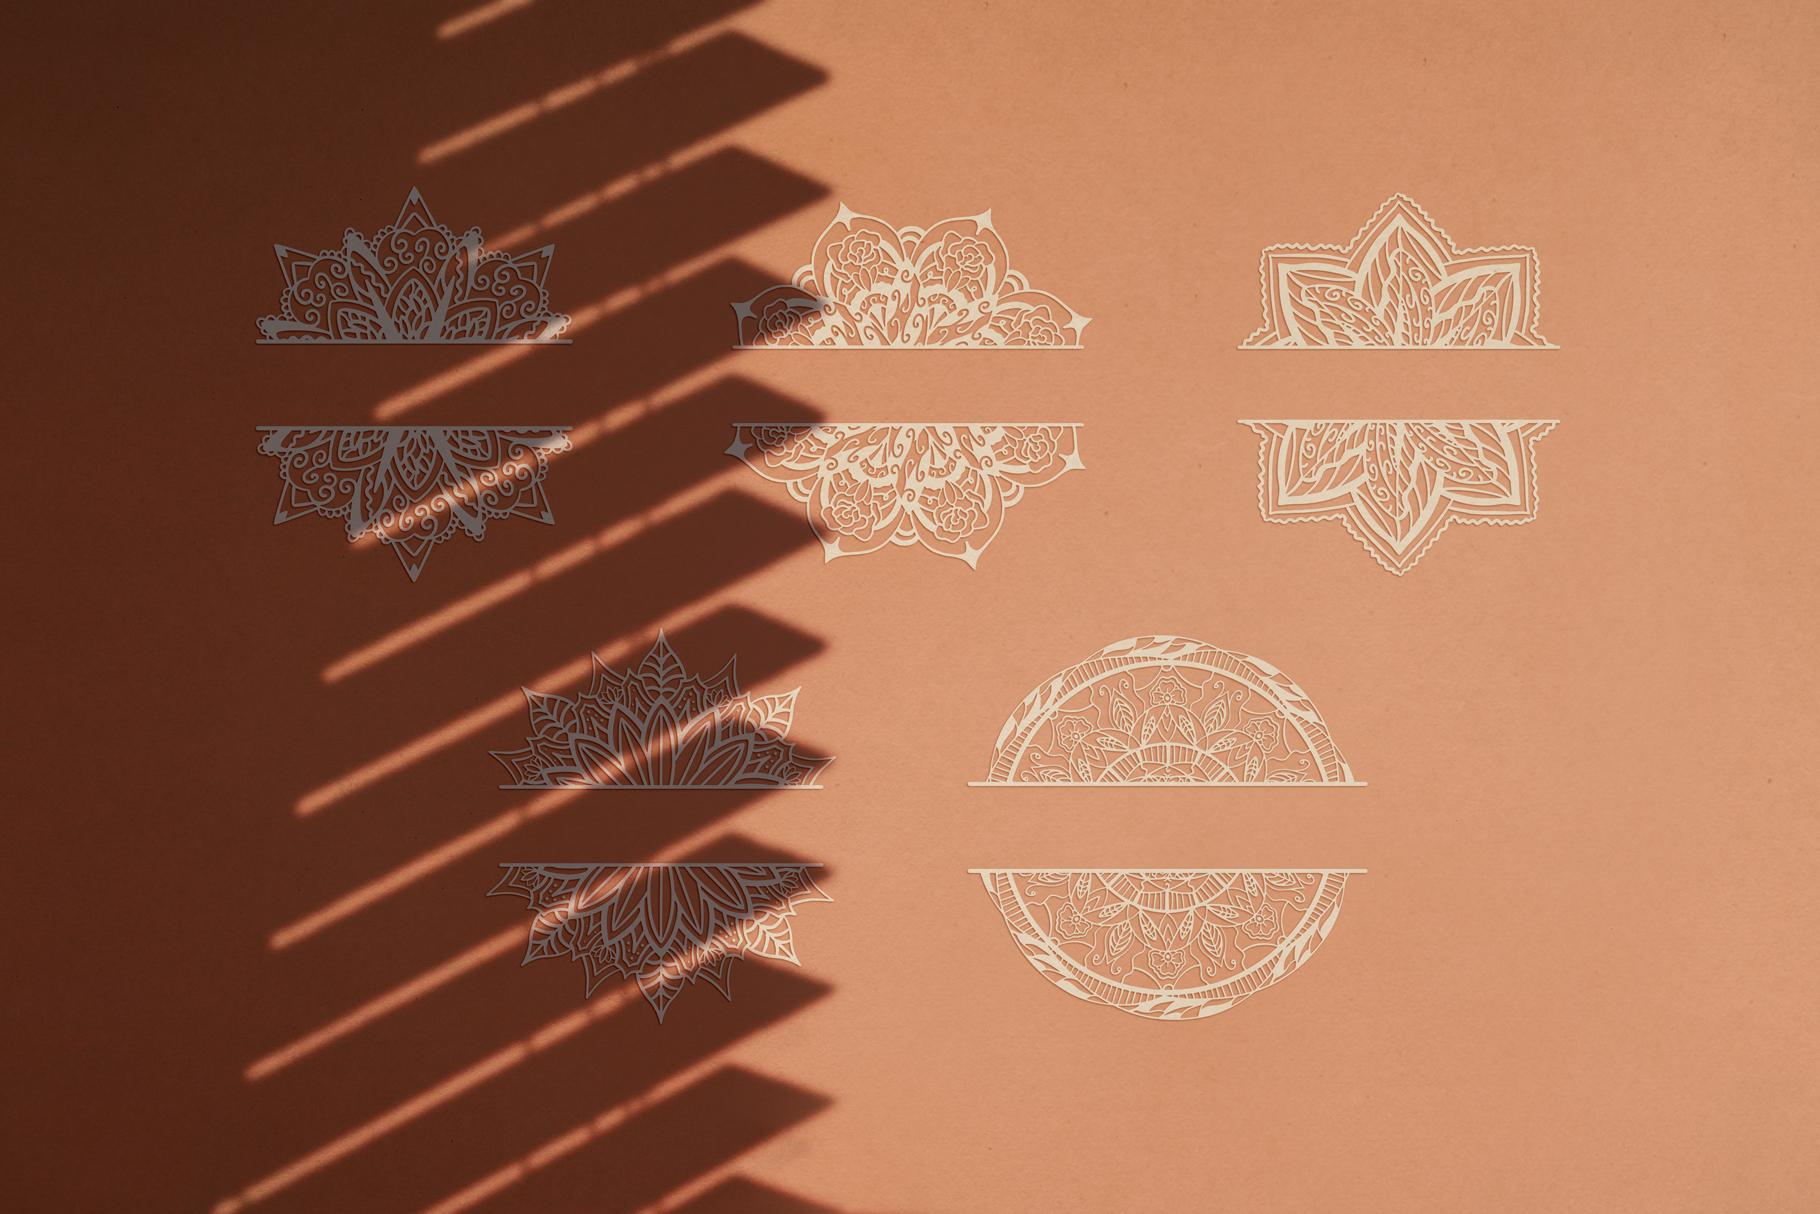 Download Mandala Monogram SVG Designs for Crafters - Crella